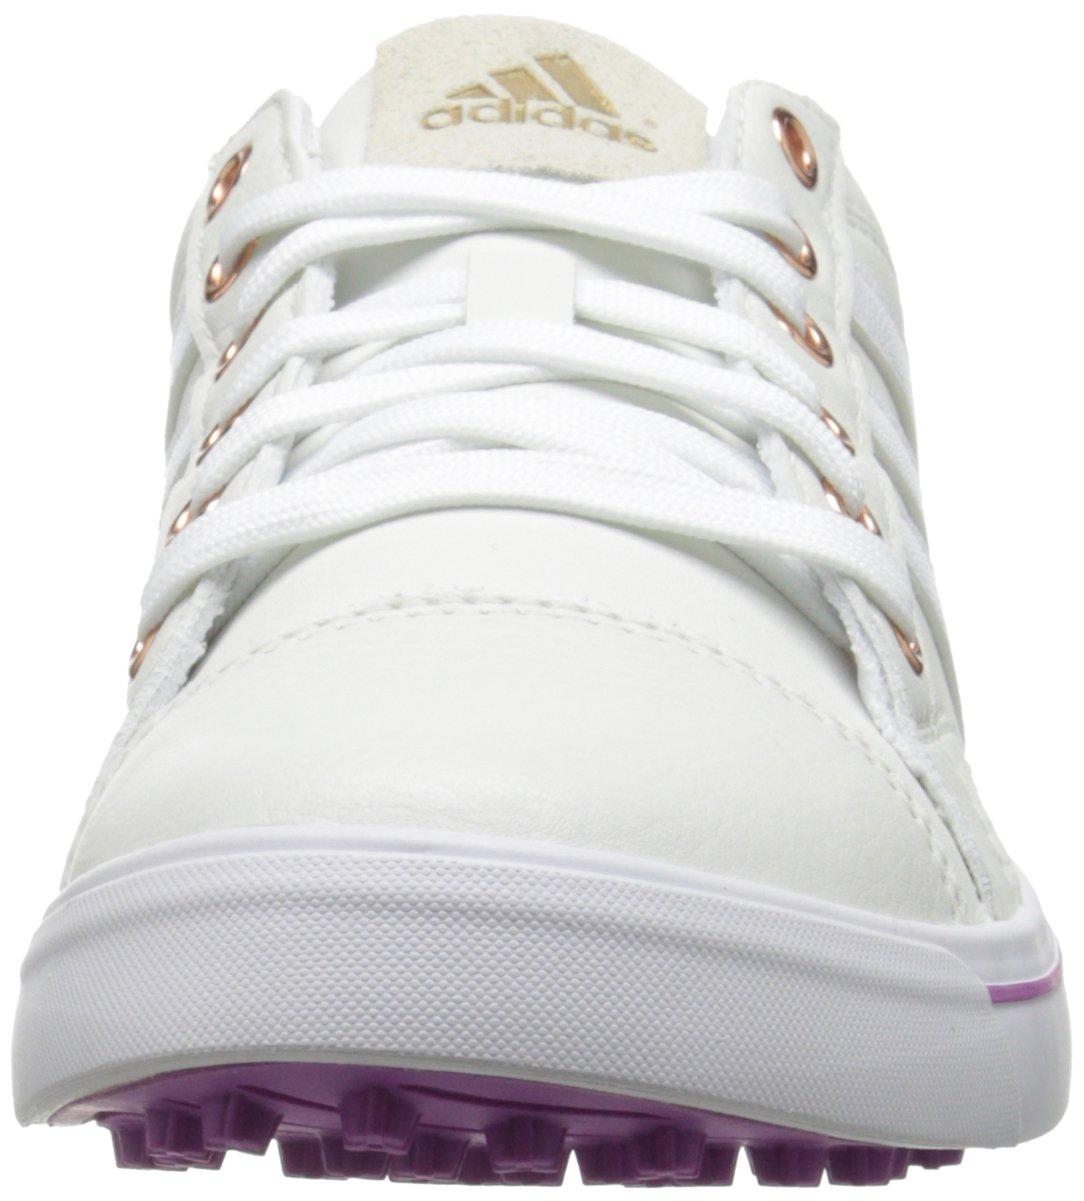 best service 64fe9 bcbdf Zapatillas de golf adidas W Adicross IV para mujer Tour Blanco  Blanco Ftw